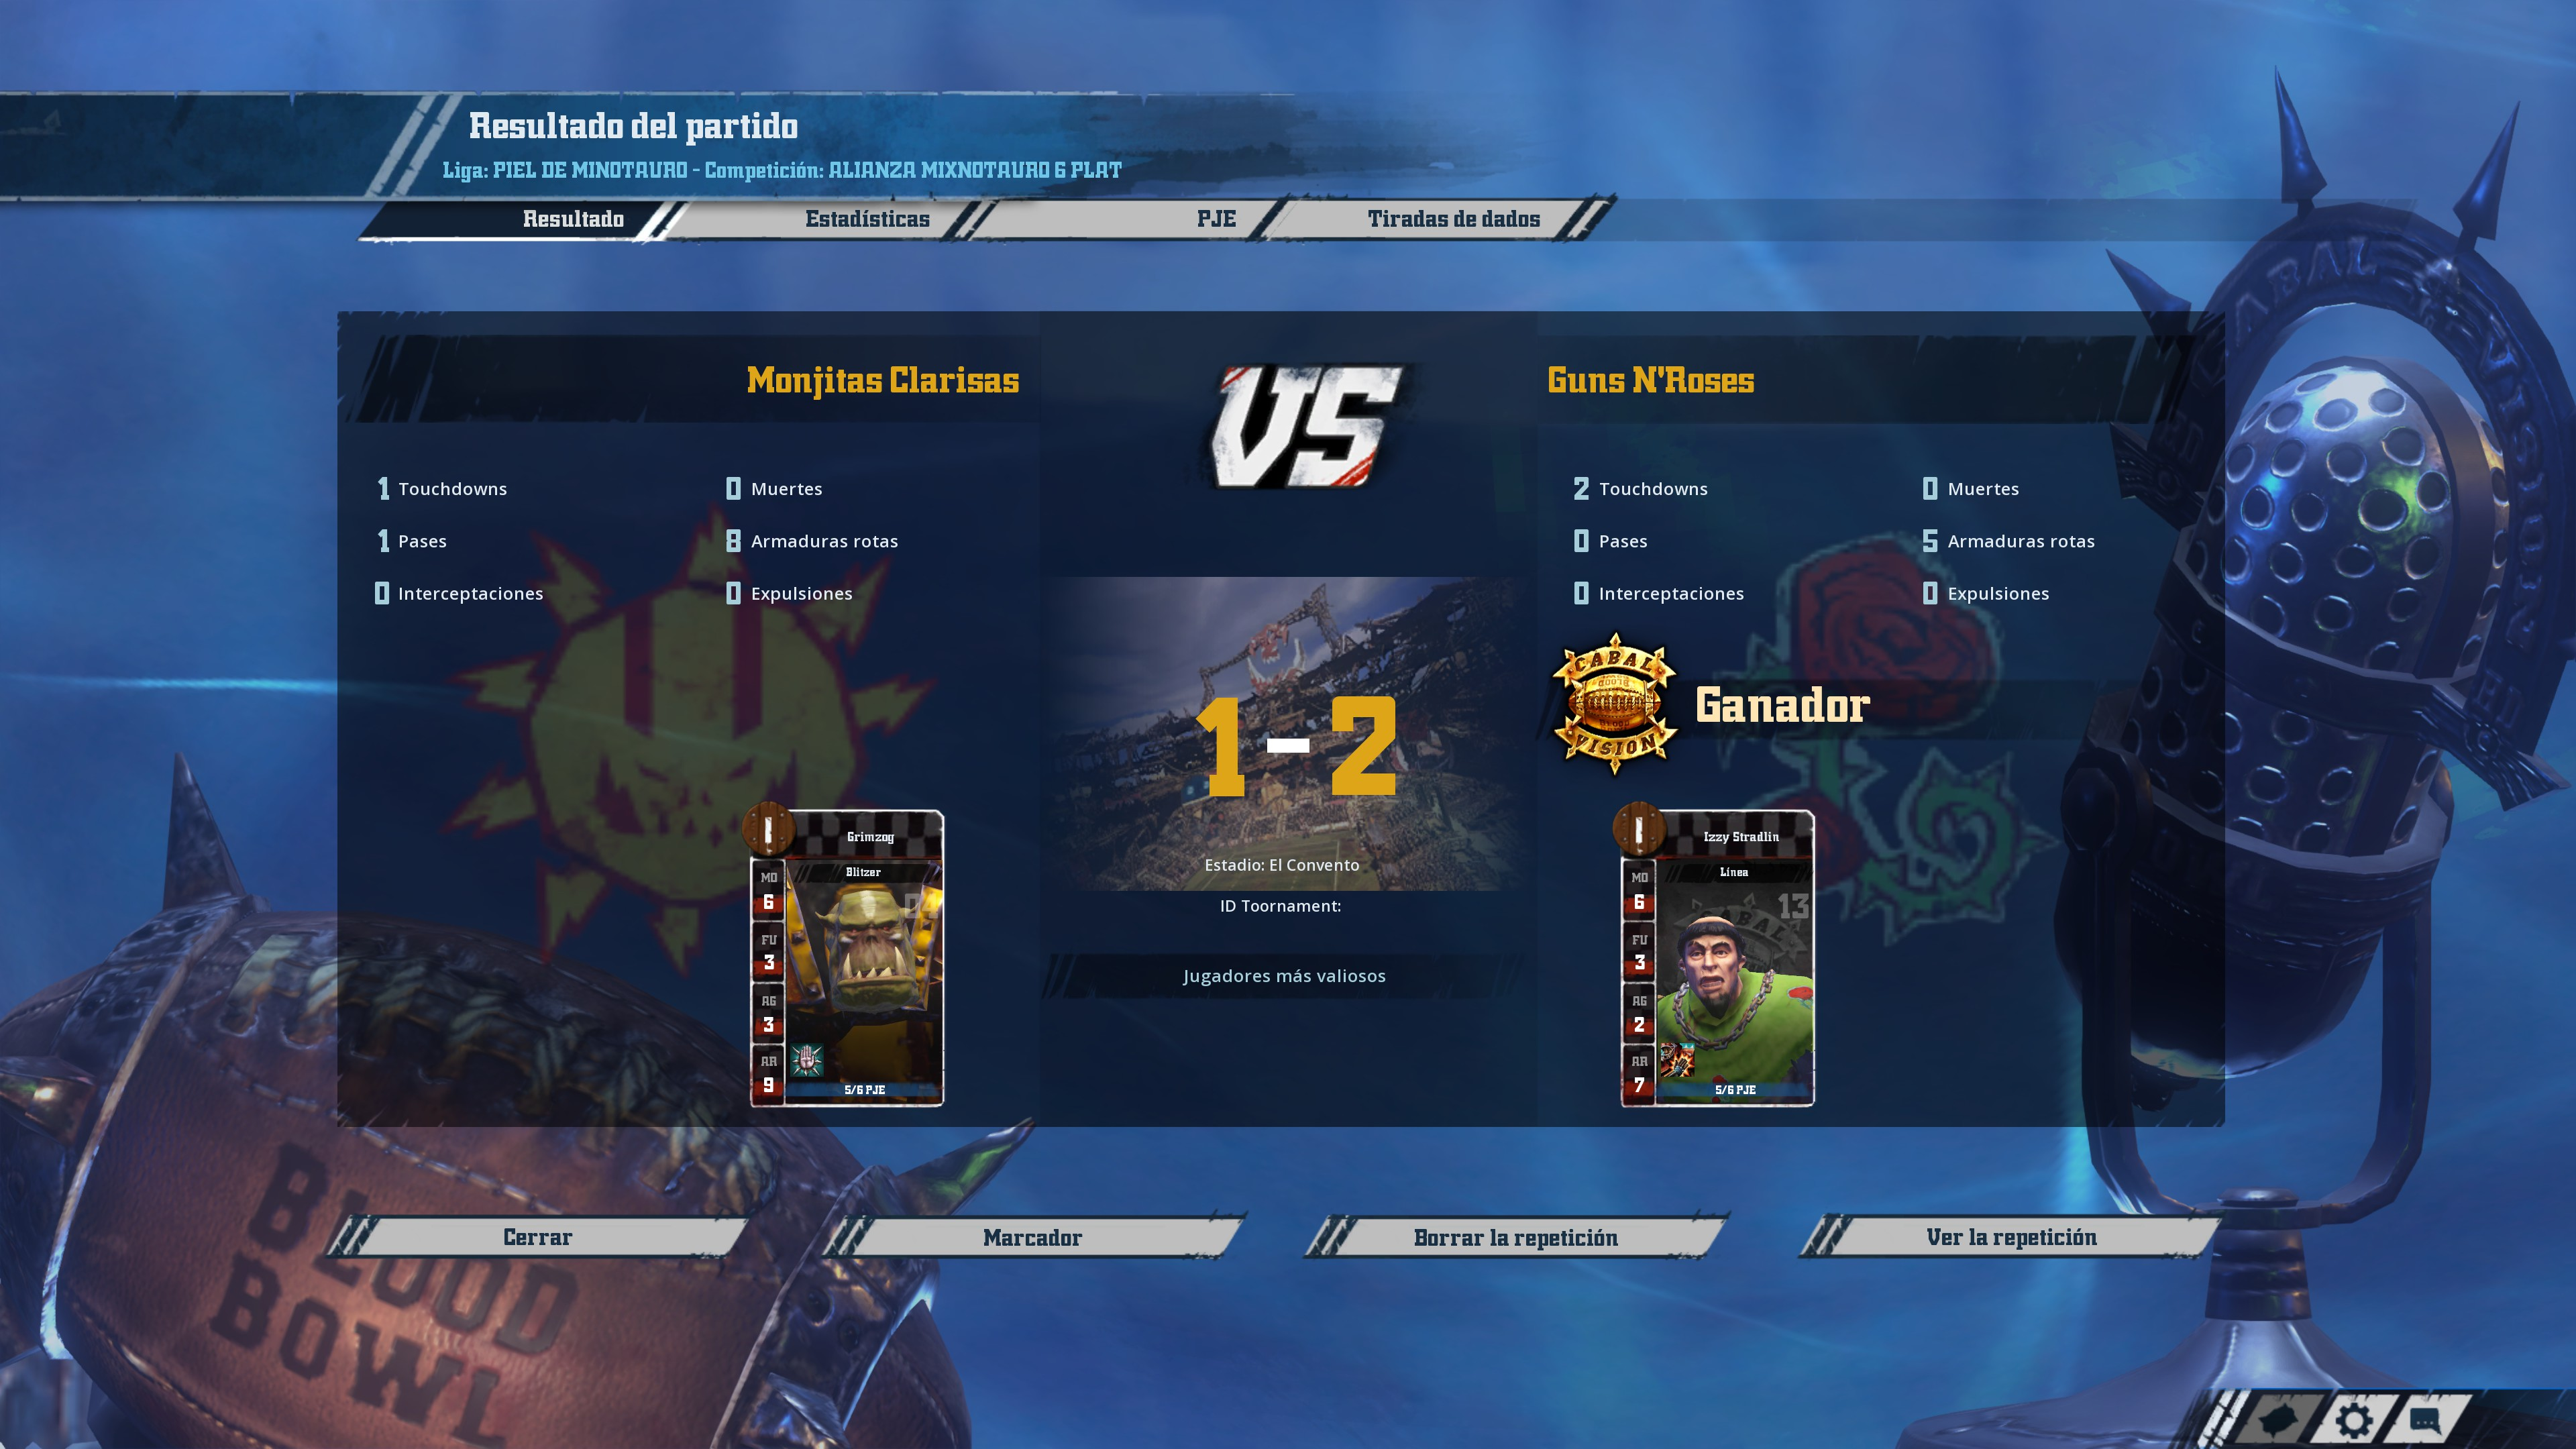 Liga Alianza Mixnotauro 6 - División Cuerno de Plata / Jornada 4 - hasta el domingo 27 de septiembre F5A4F5FD9F188873141D0B3702048C5478A4507E